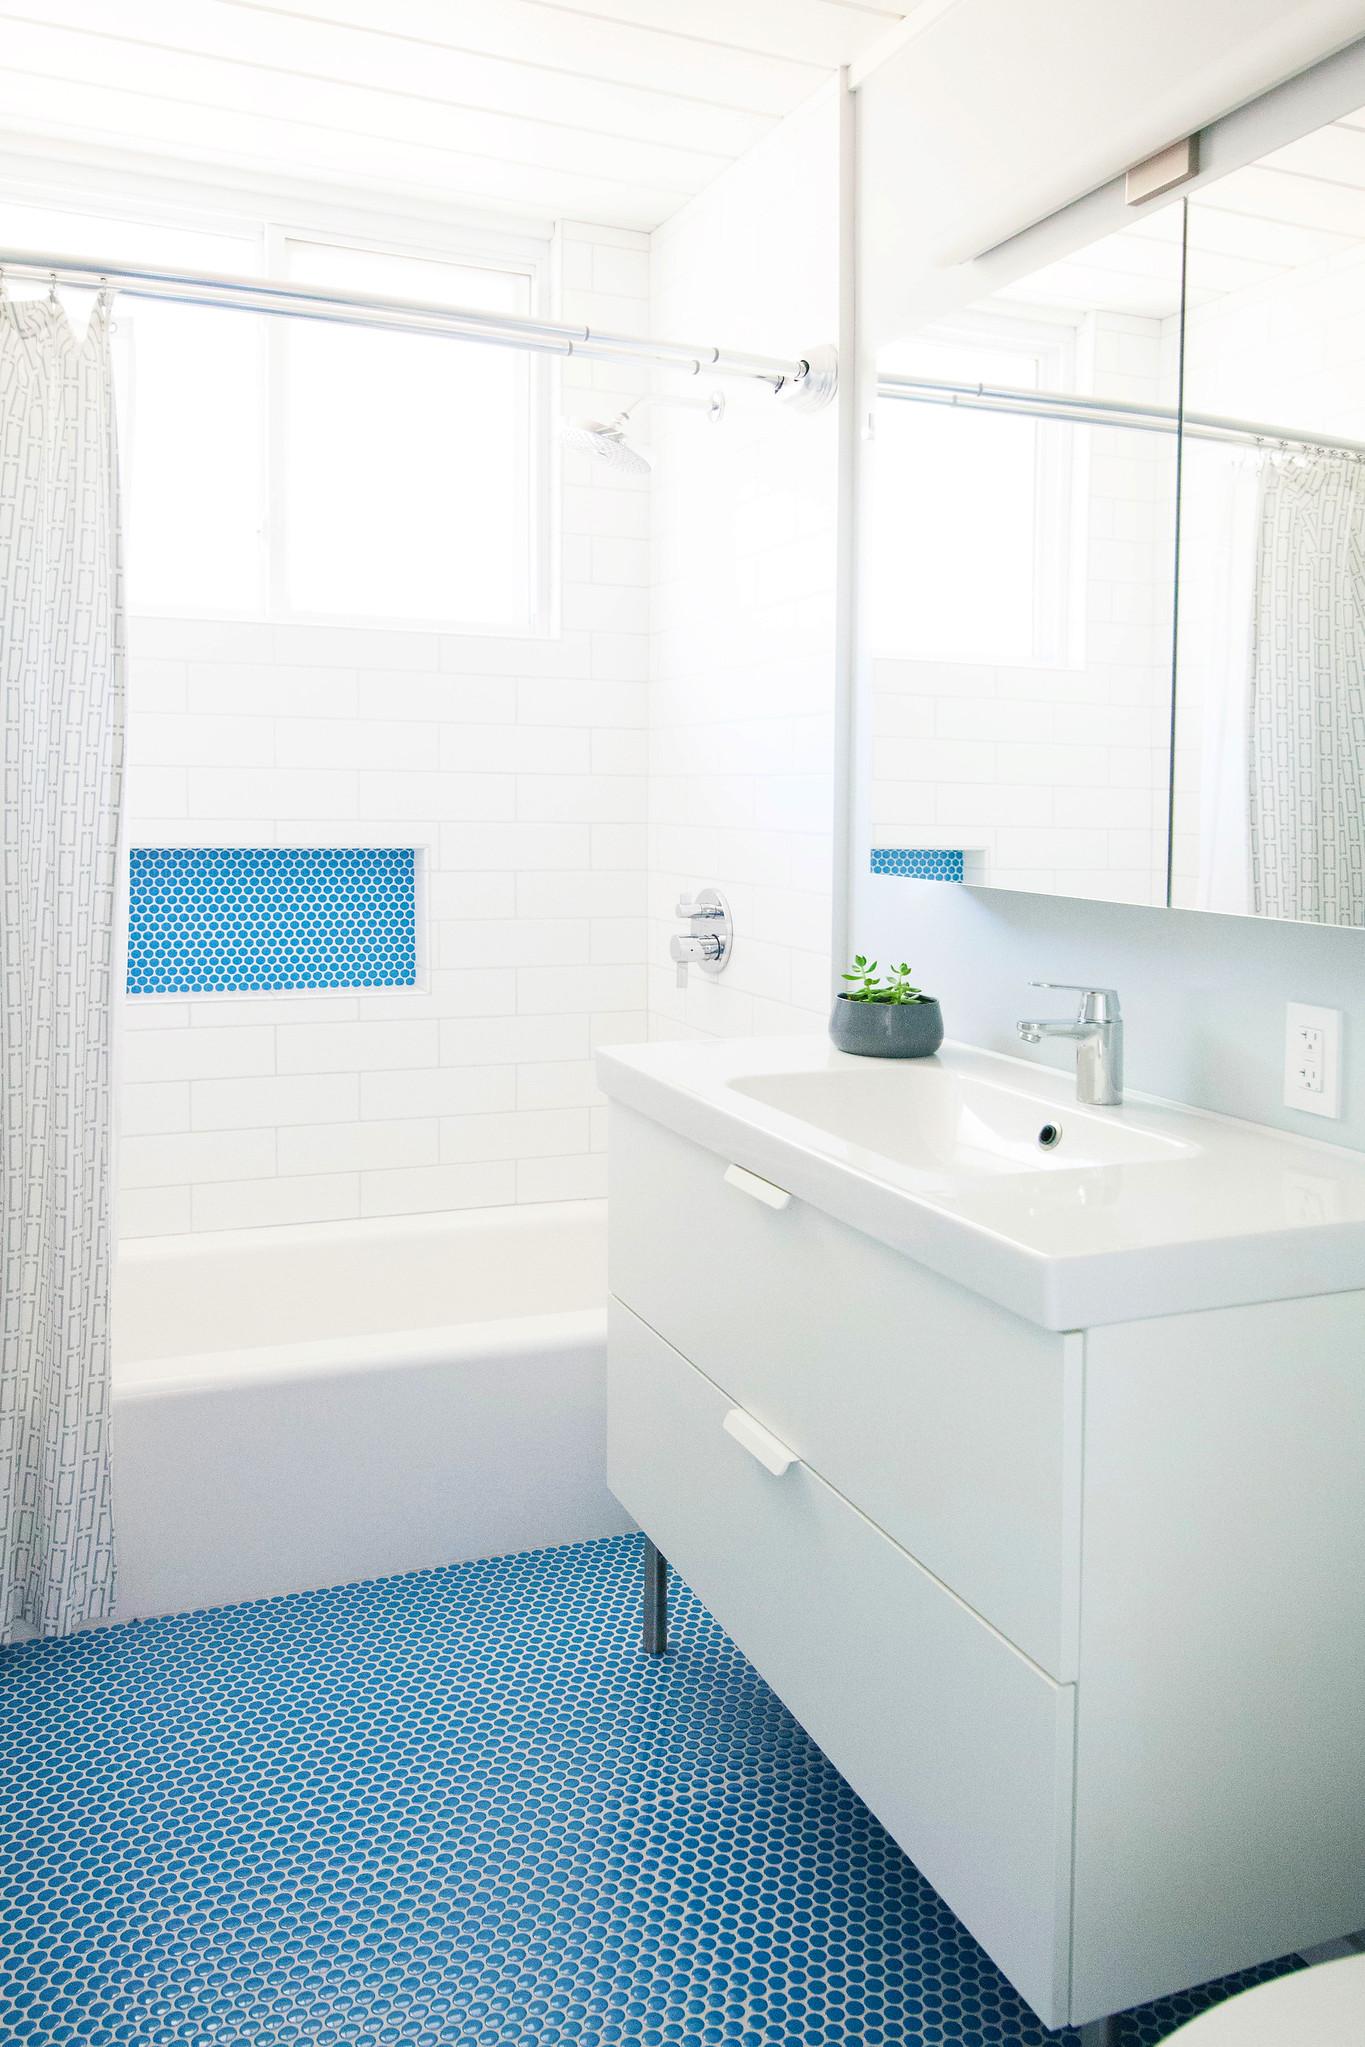 airbnb-bath.jpg